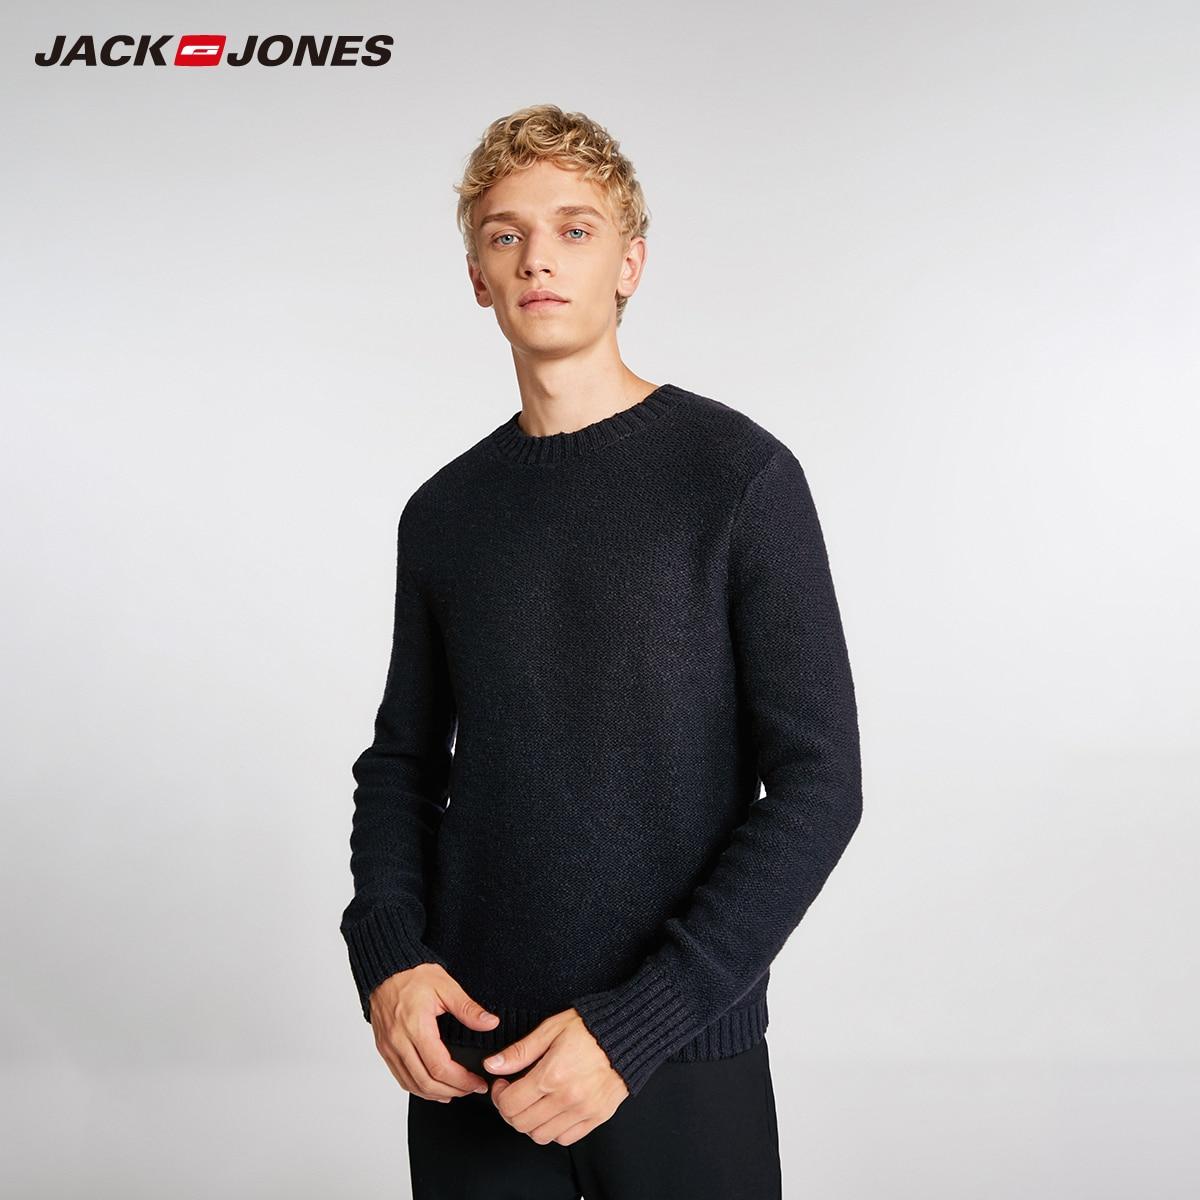 JackJones Men's Basic Solid Colour Wool Fabric Sweater 218425528